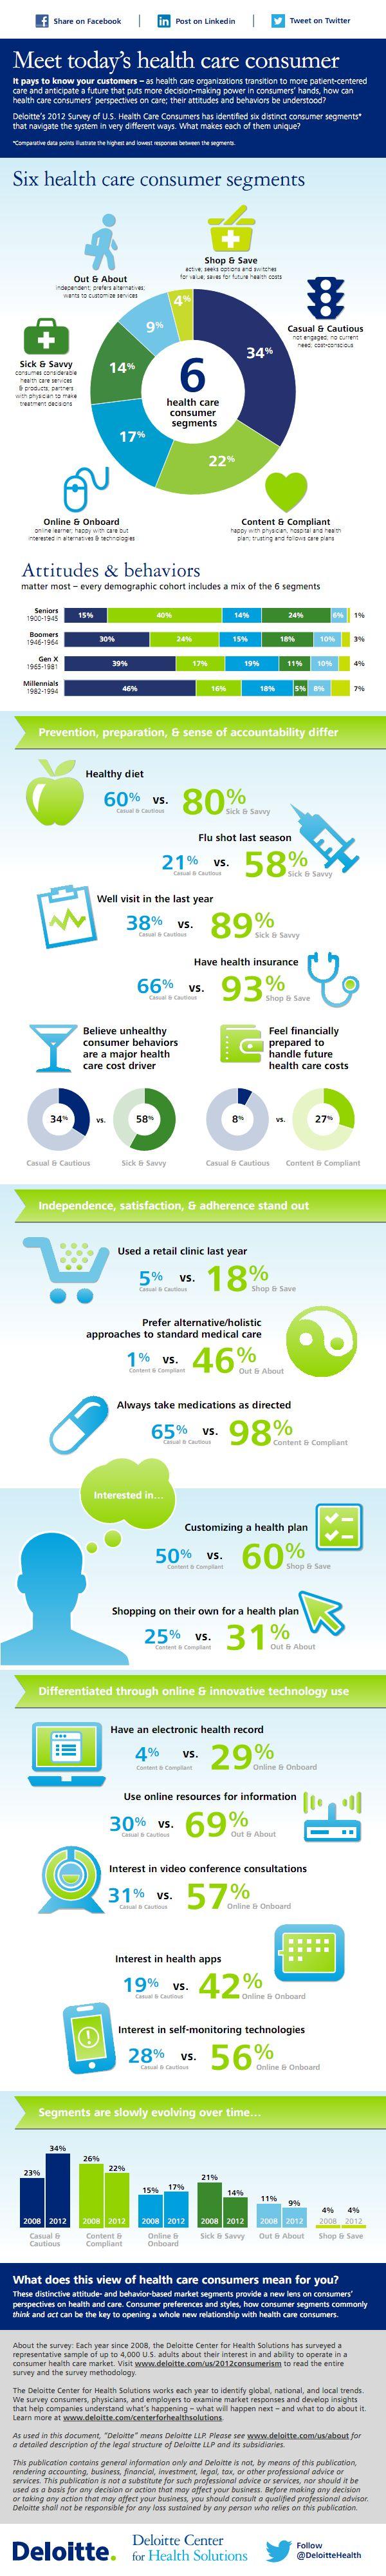 Six healthcare consumer segments_001